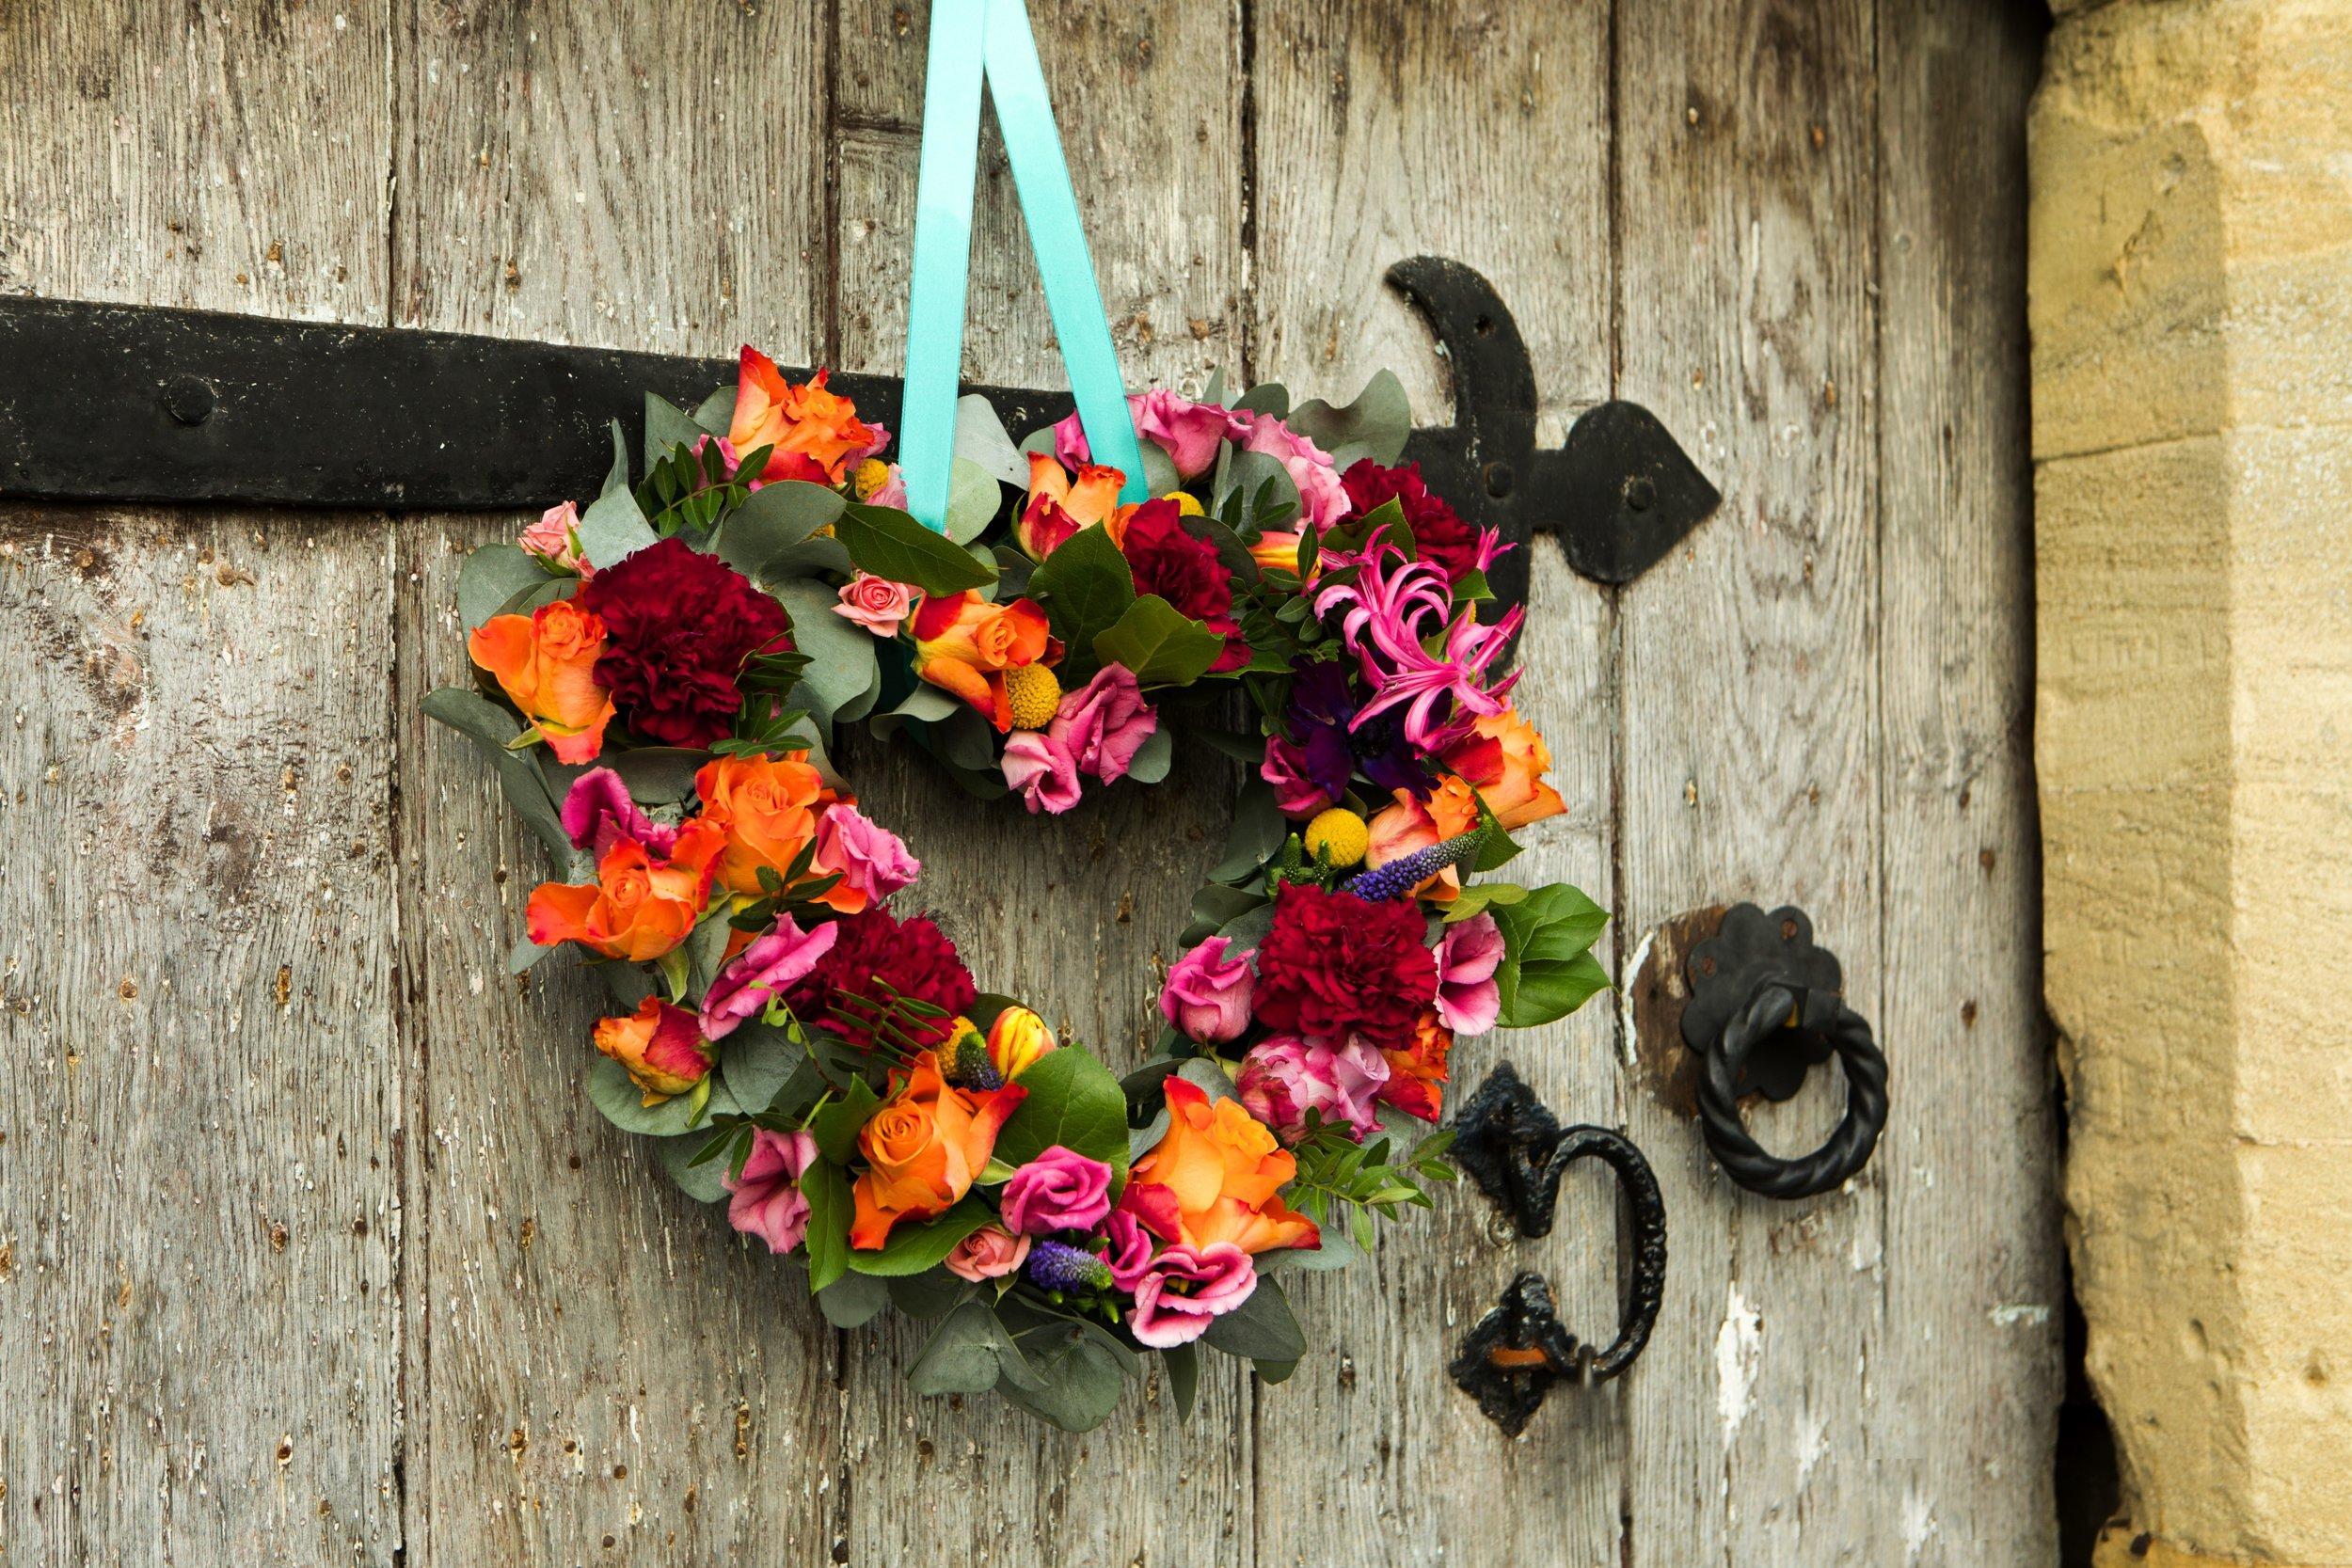 5. Flowers -